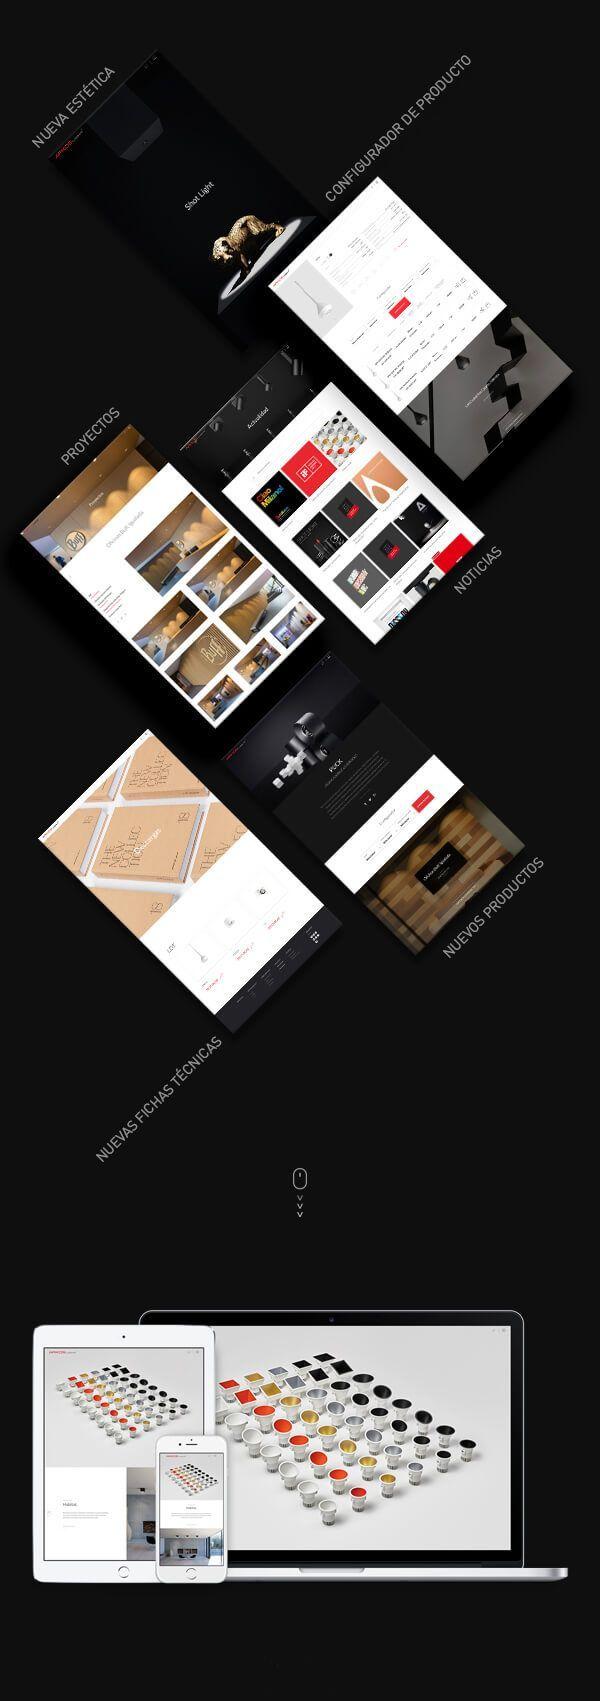 nueva web - Arkoslight